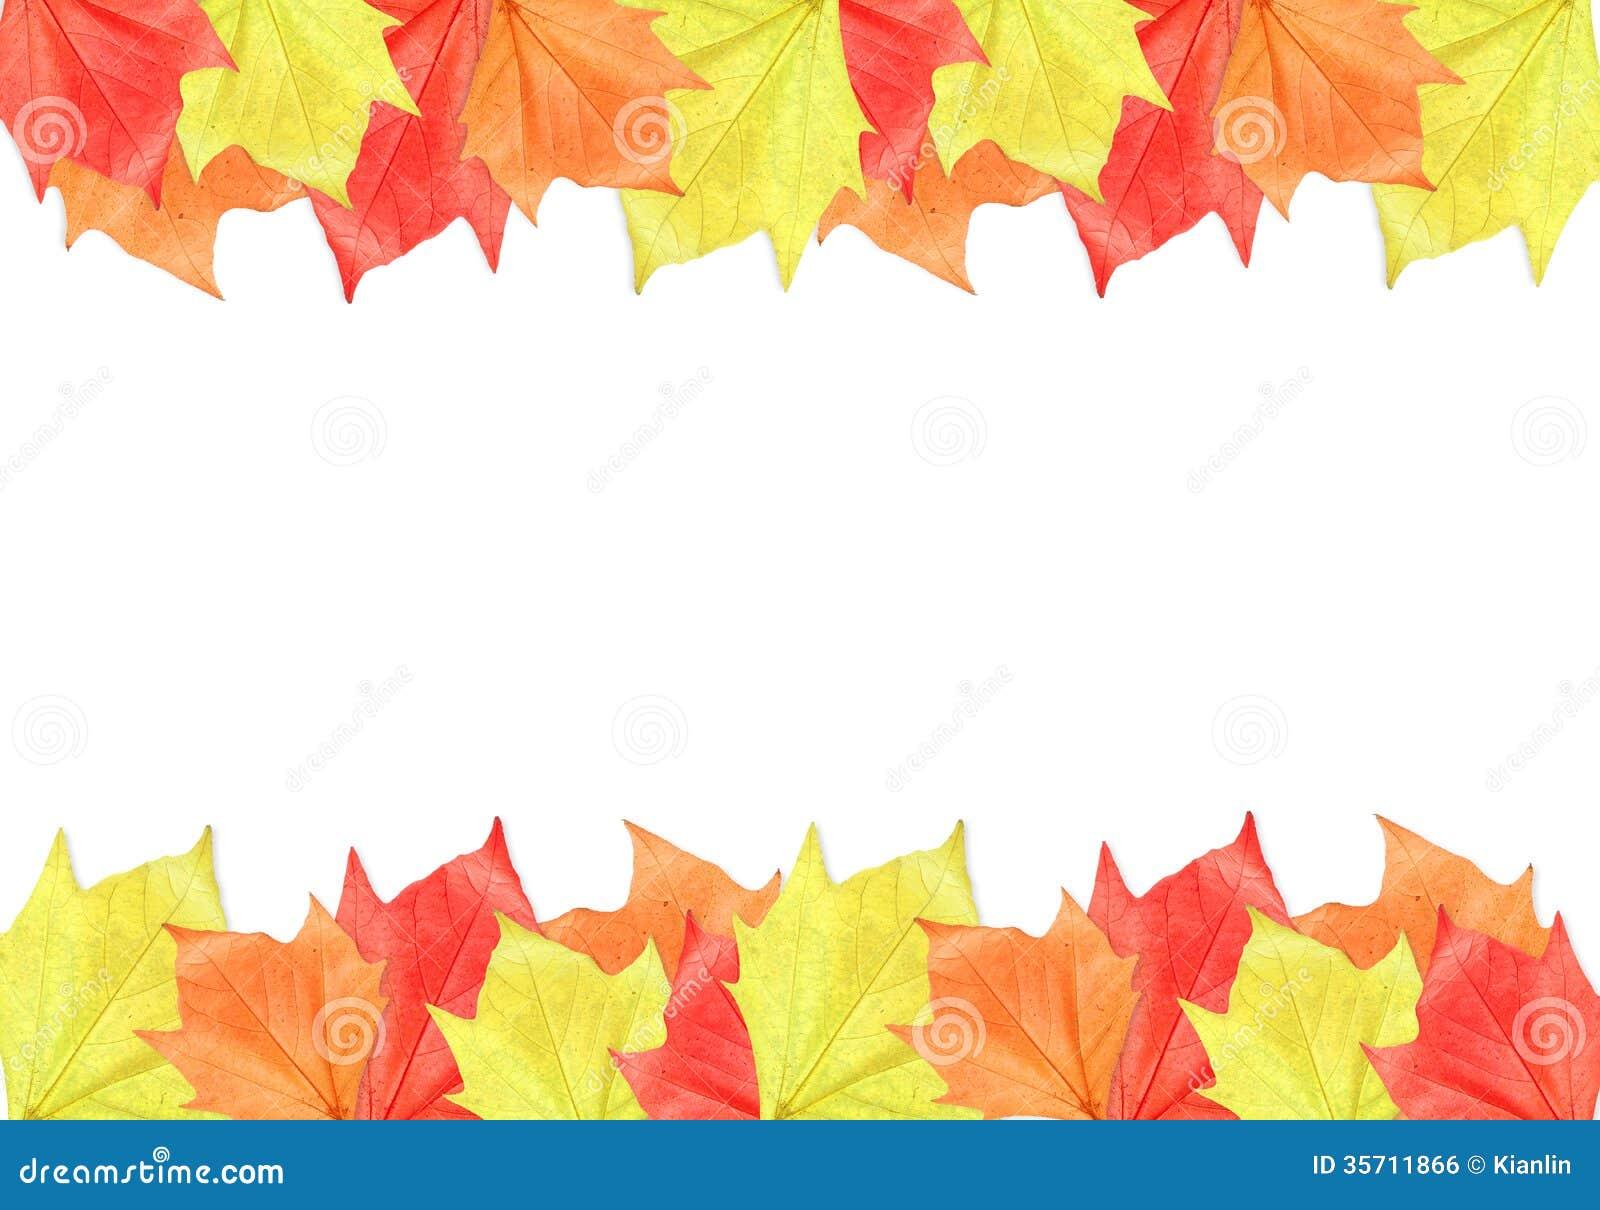 Maple Leaf Frame stock photo. Image of october, november - 35711866